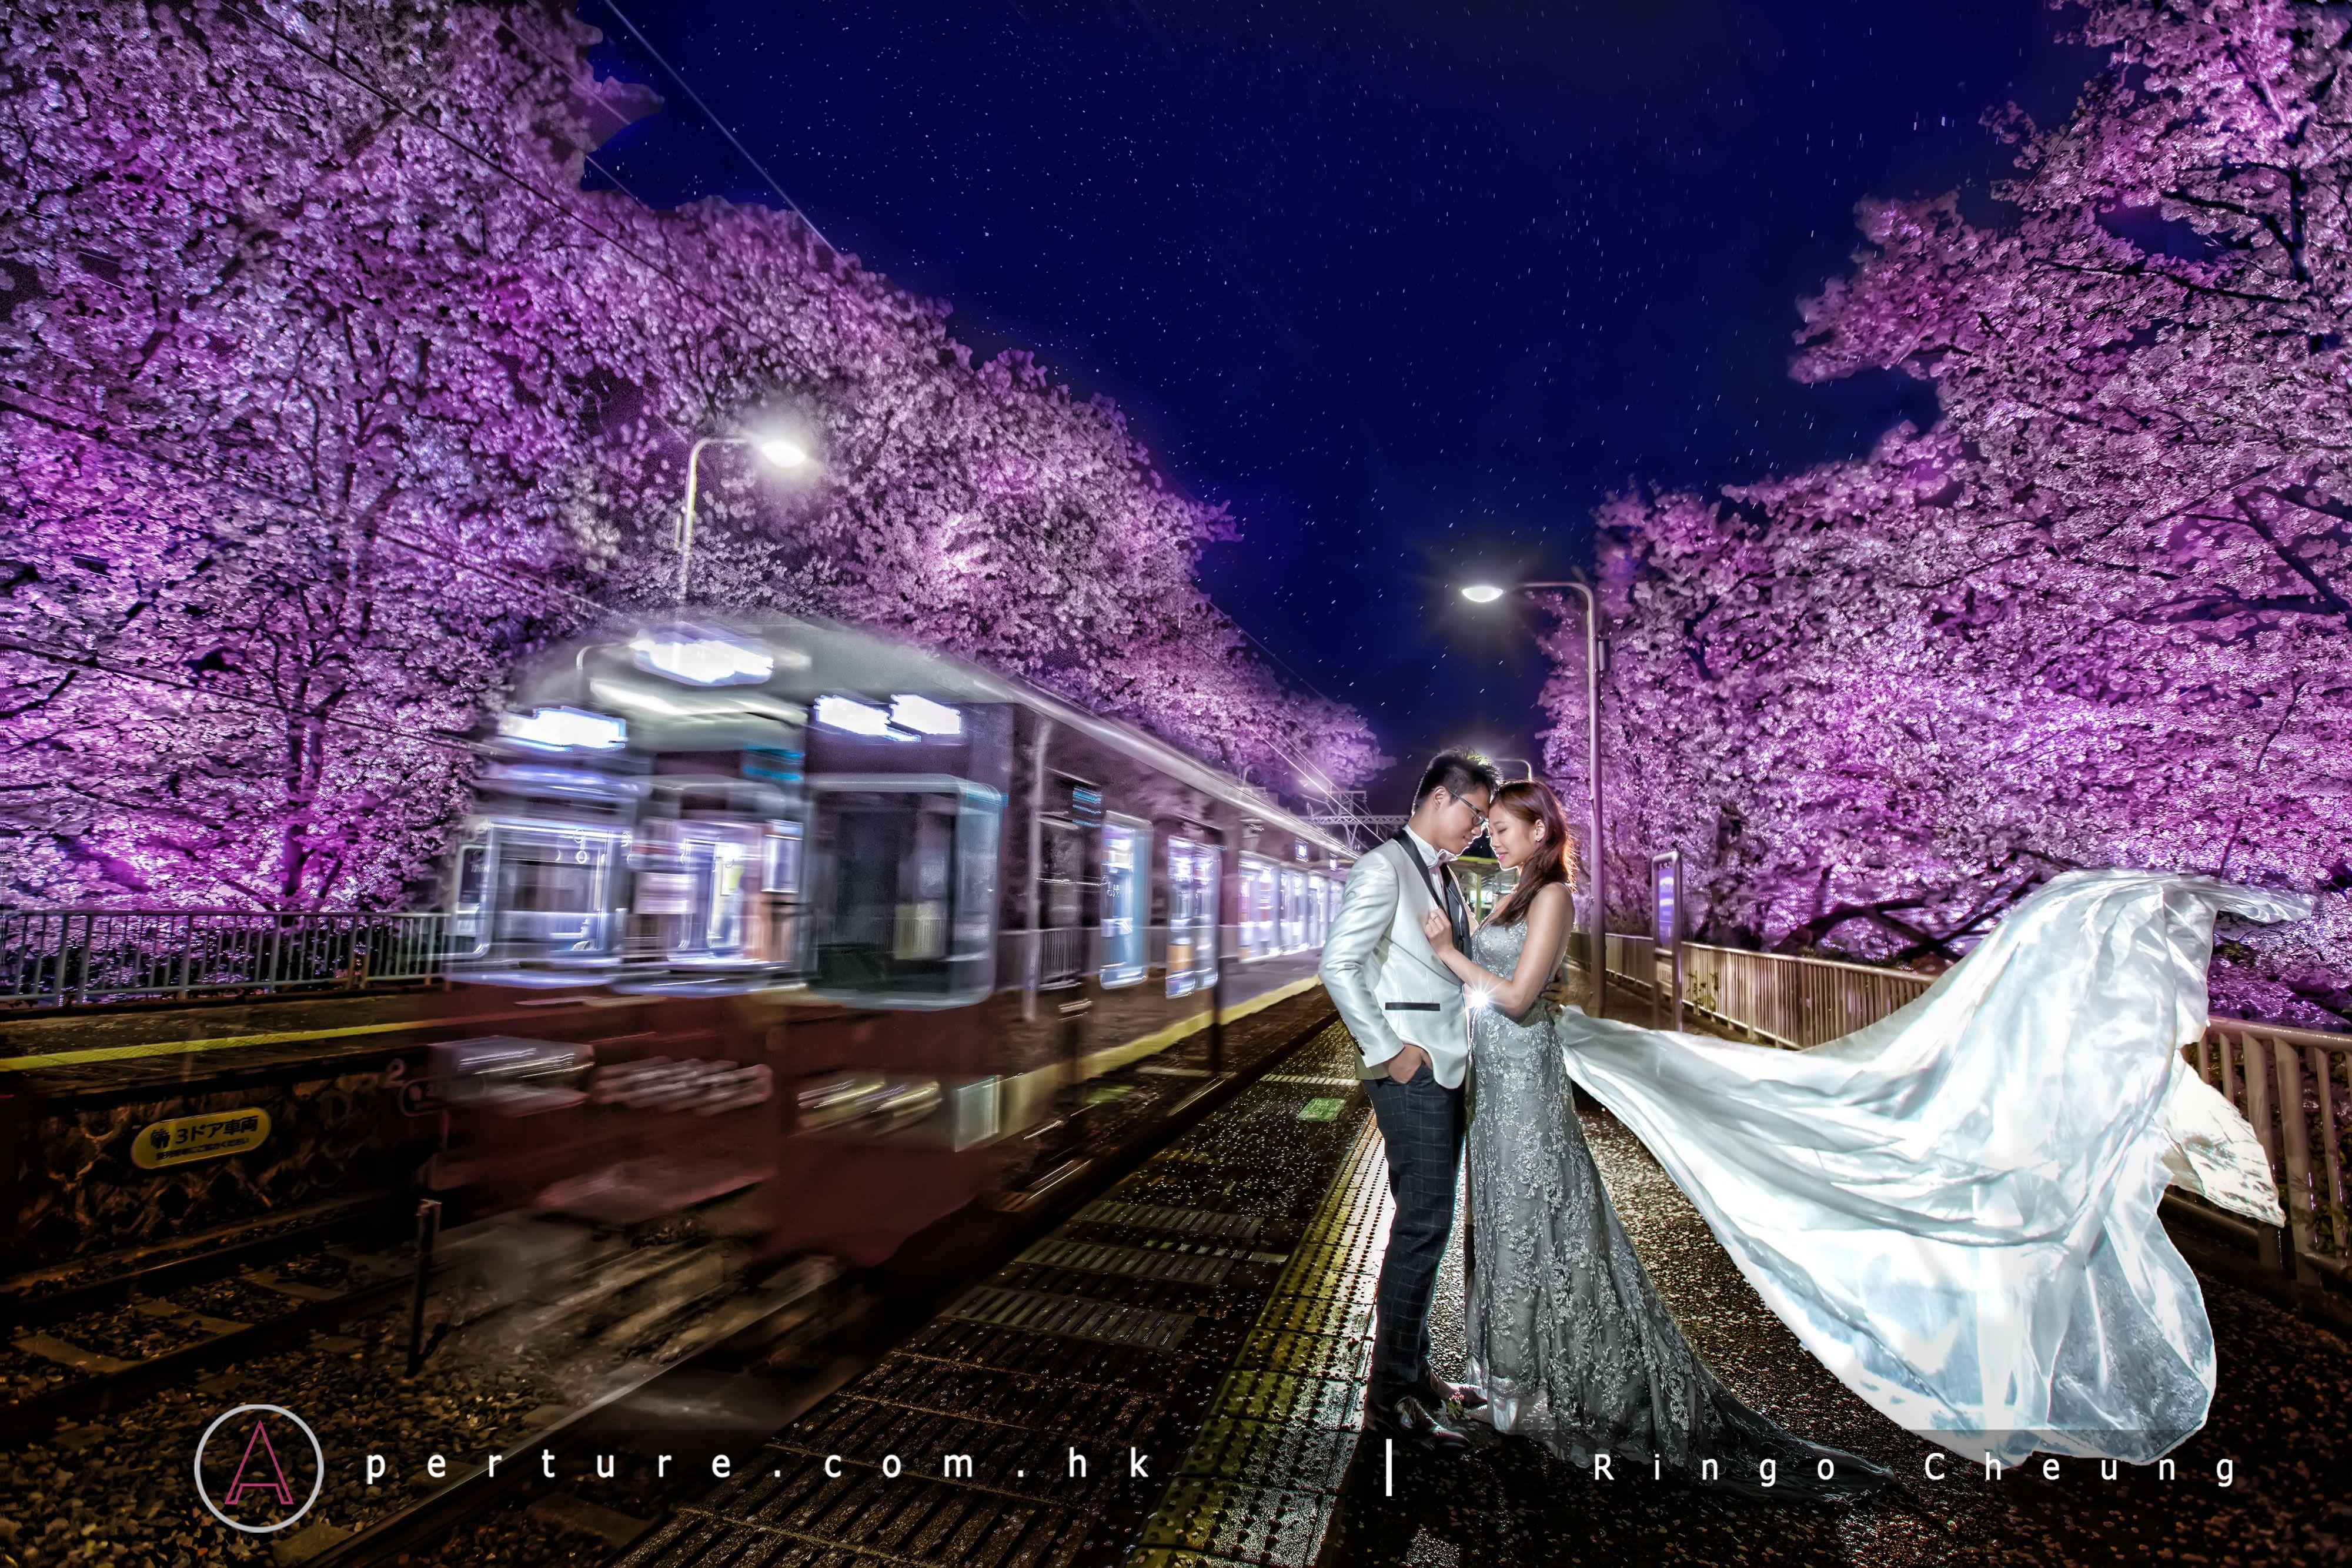 Wedding Photography Pre Wedding Photography Prewedding Photography Wedding Photography Pre Wedding